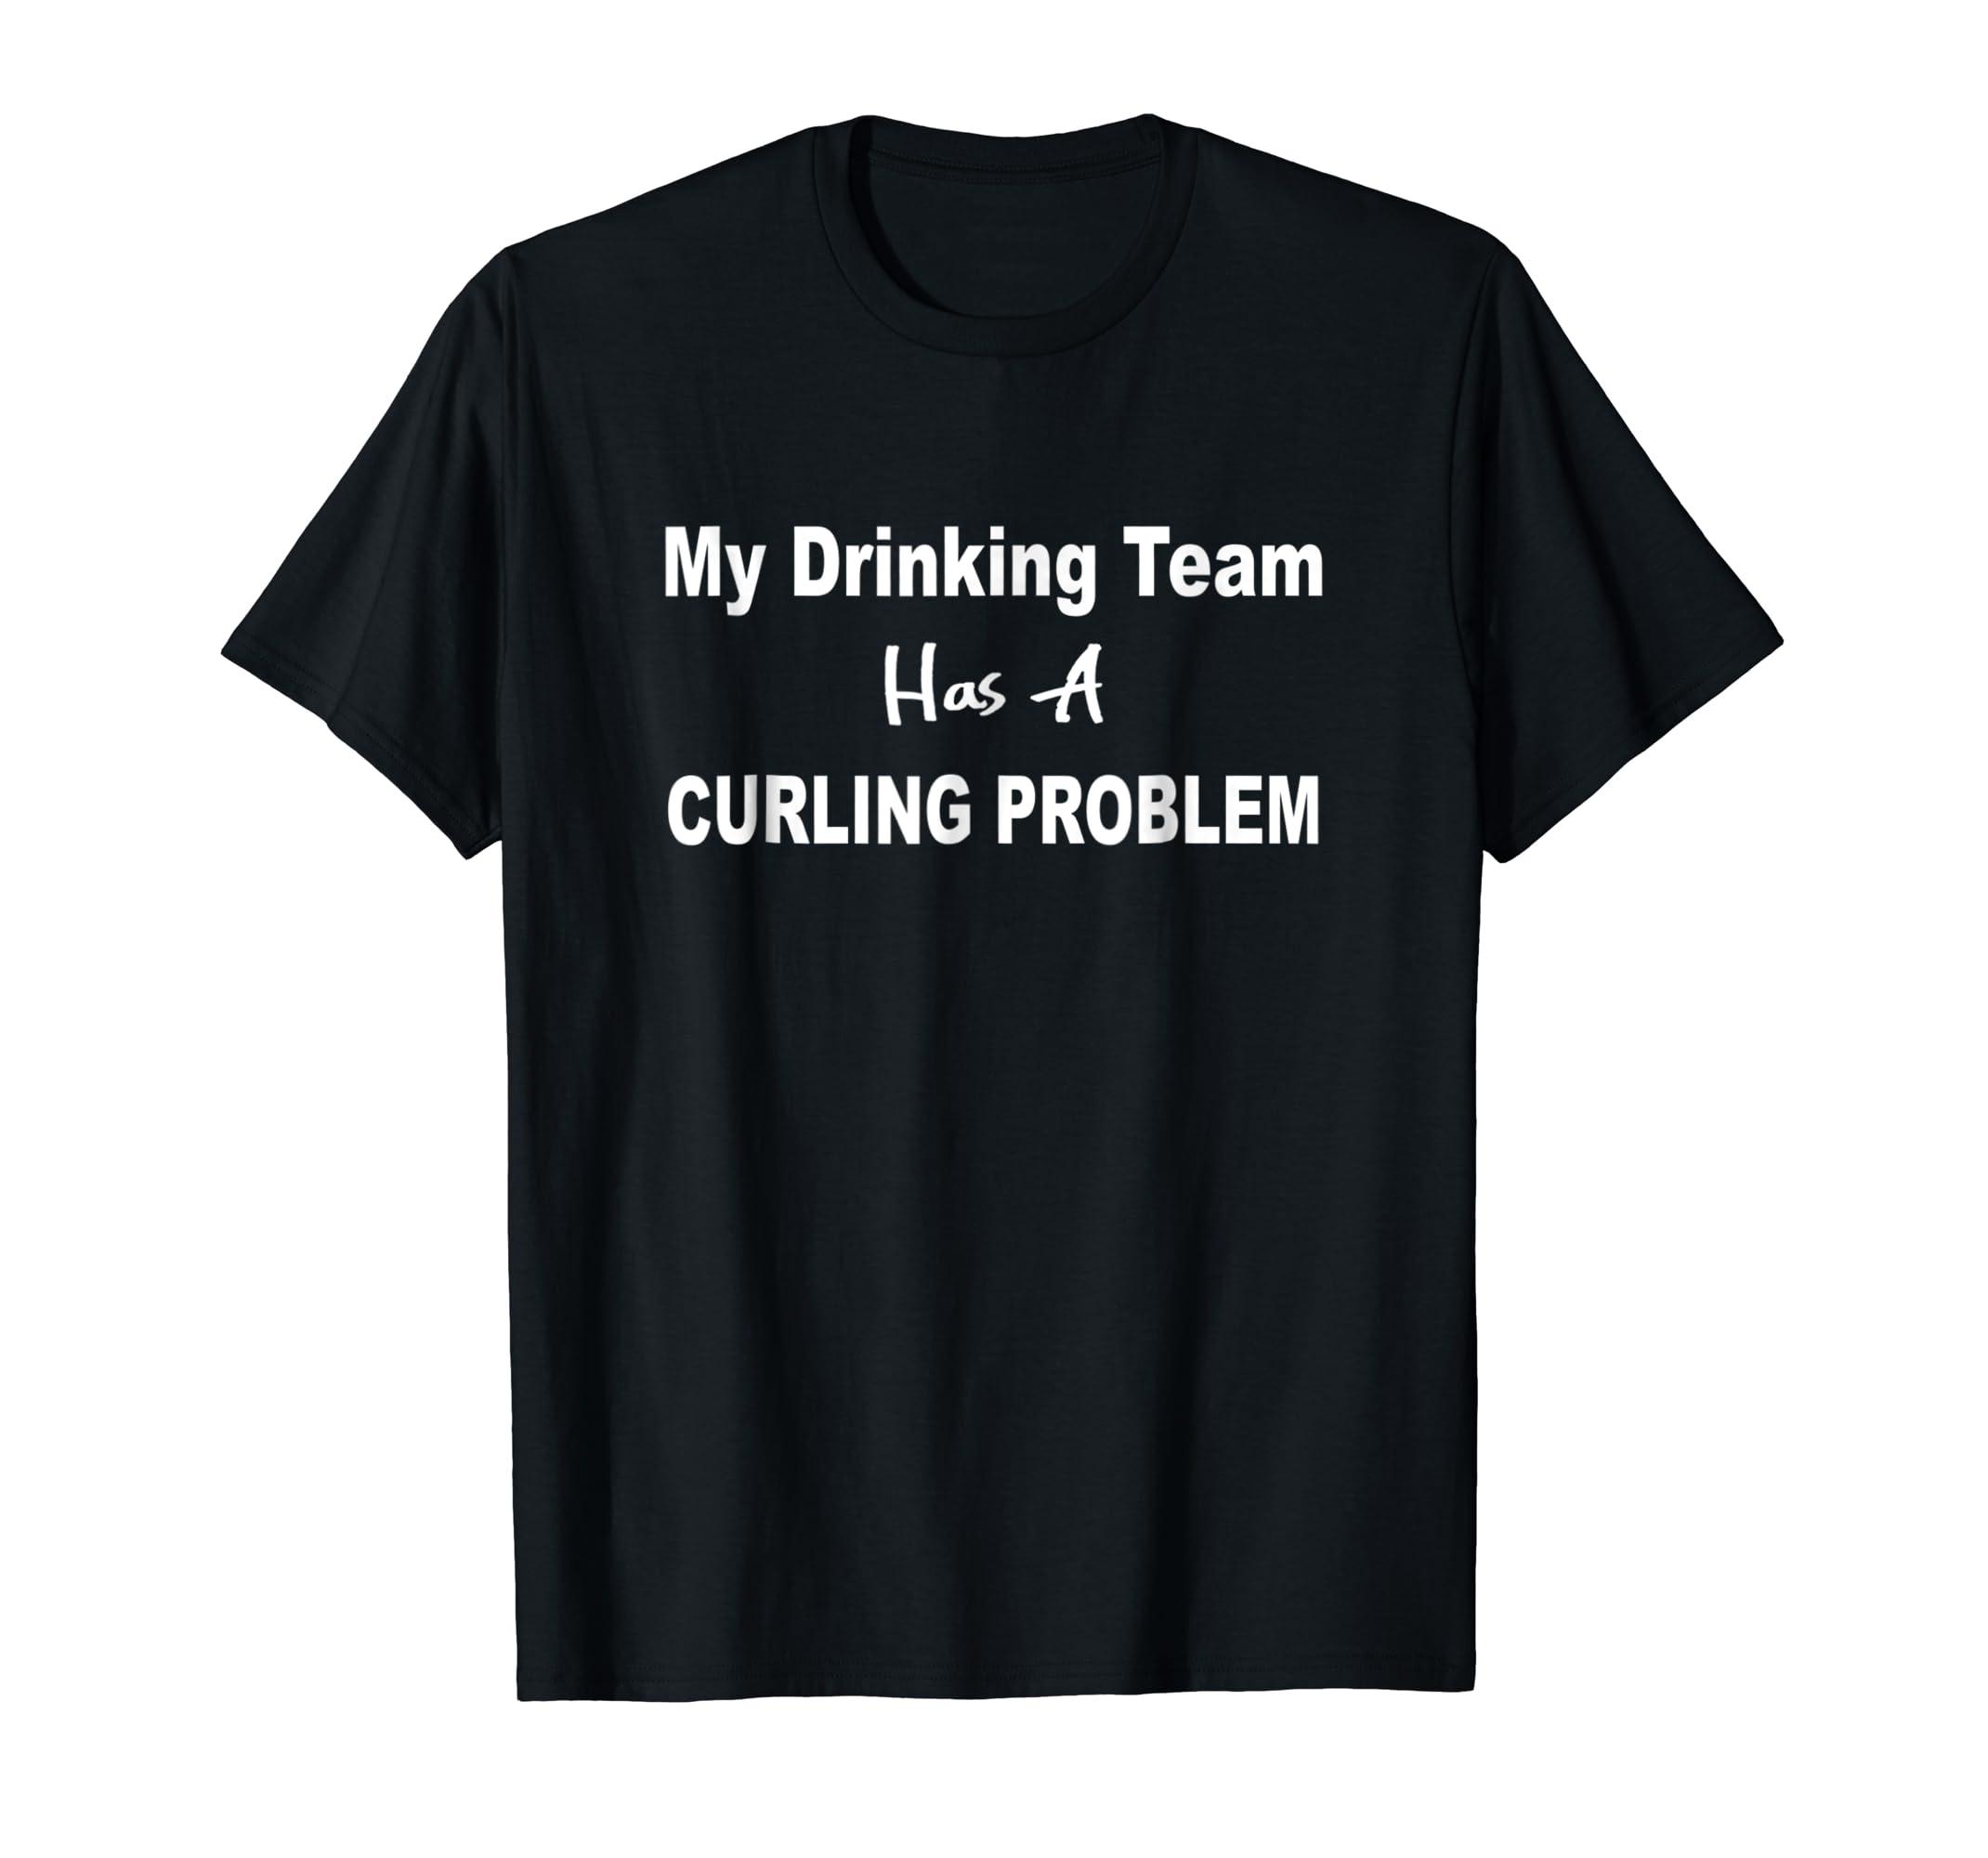 1c4f512bb Amazon.com: Funny Curling T-Shirt: Clothing